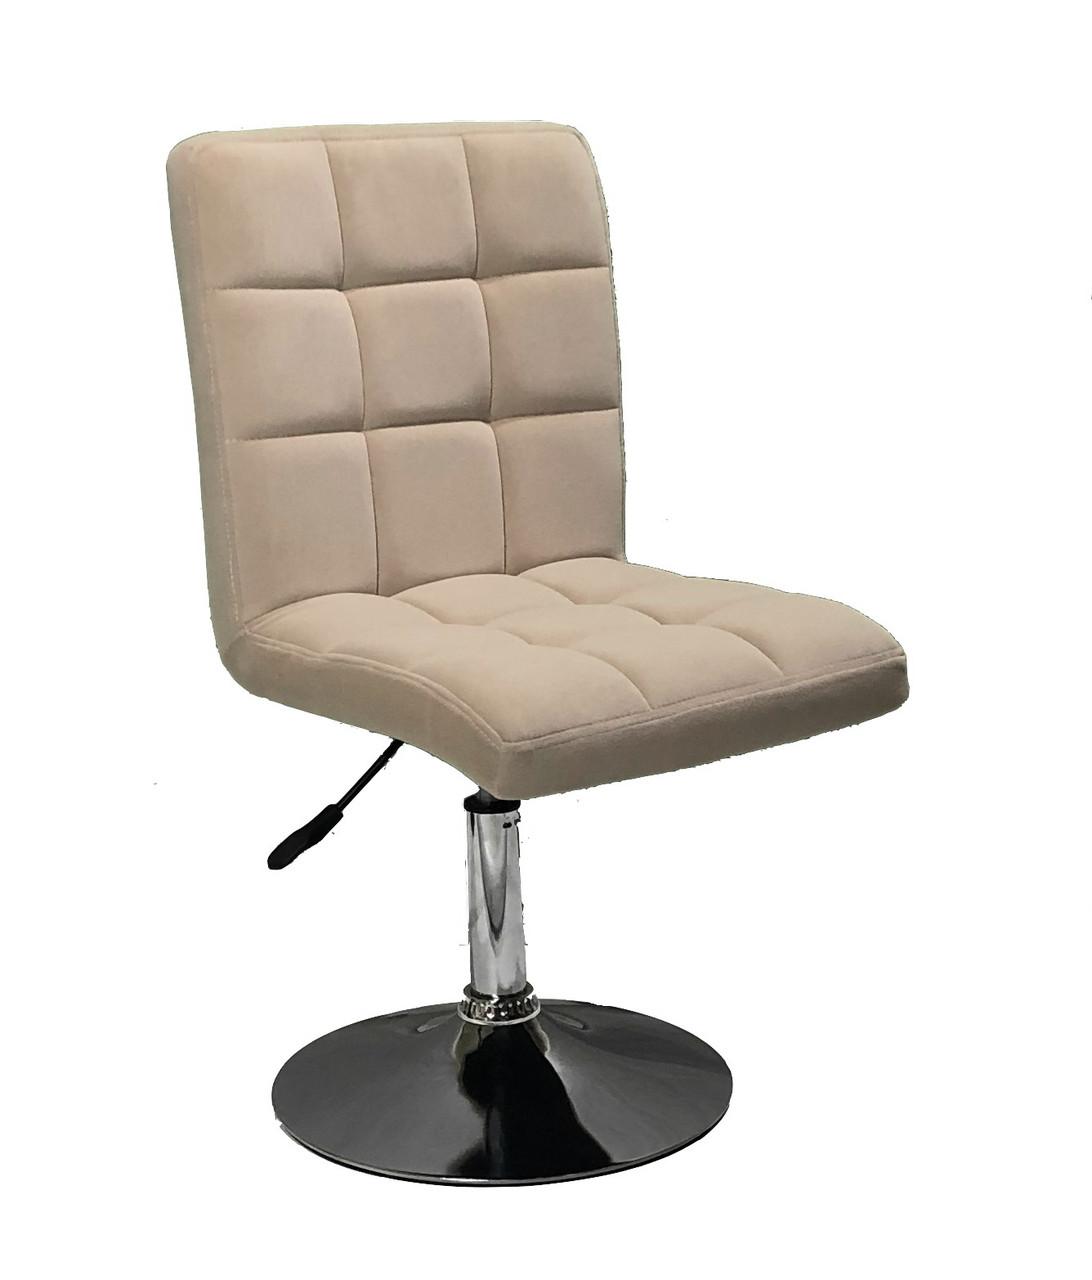 Кресло парикмахера Augusto (Августо) CH-BASE серый бархат, на блине